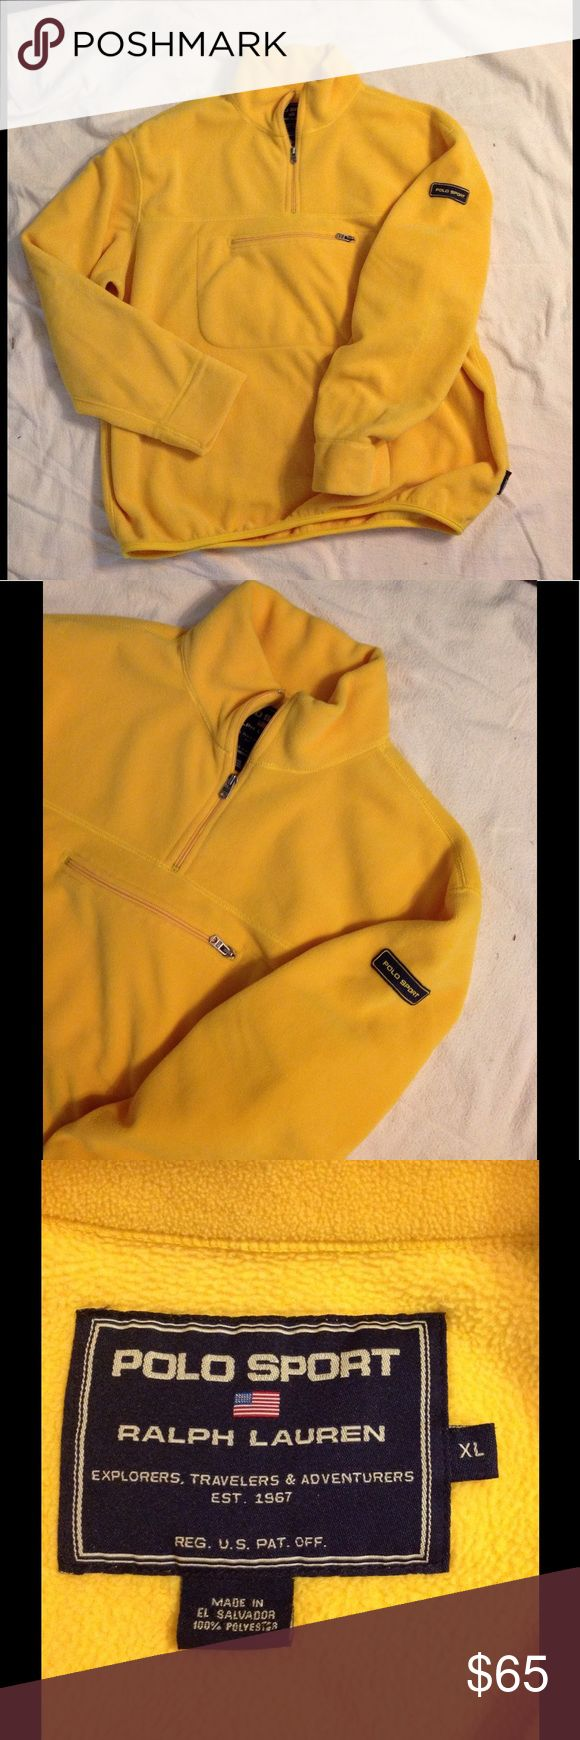 Ralph Lauren Polo Sport Fleece Pullover XL Very nice RL Polo Sport fleece pullover. Color is a yellow/gold. Size XL. Great condition Polo by Ralph Lauren Jackets & Coats